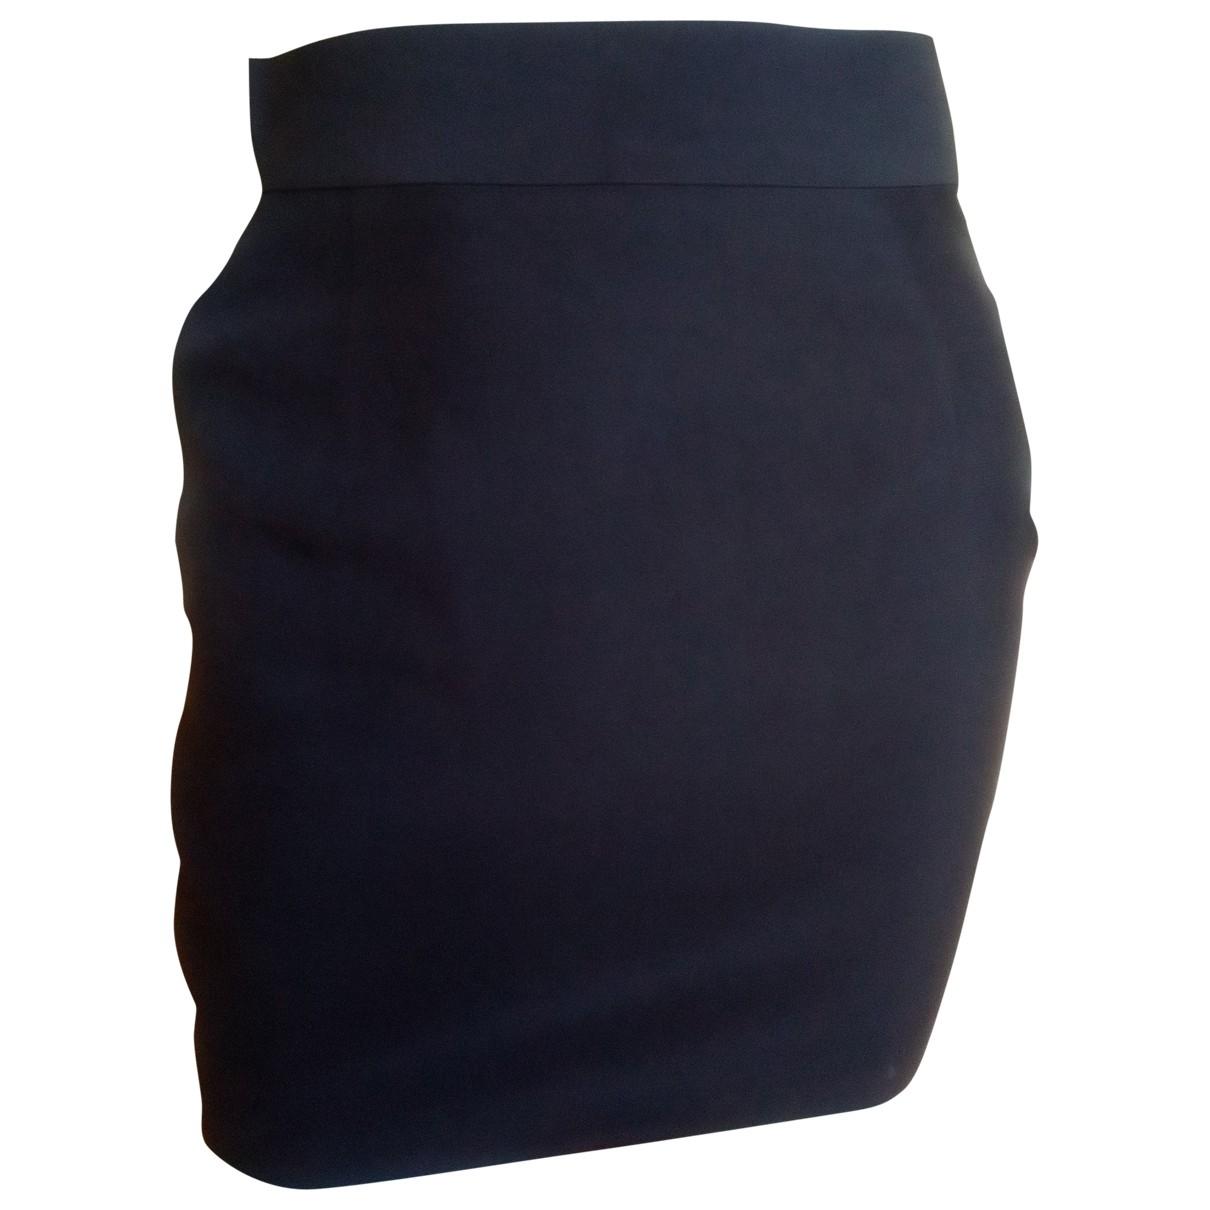 Moschino \N Black skirt for Women 40 IT